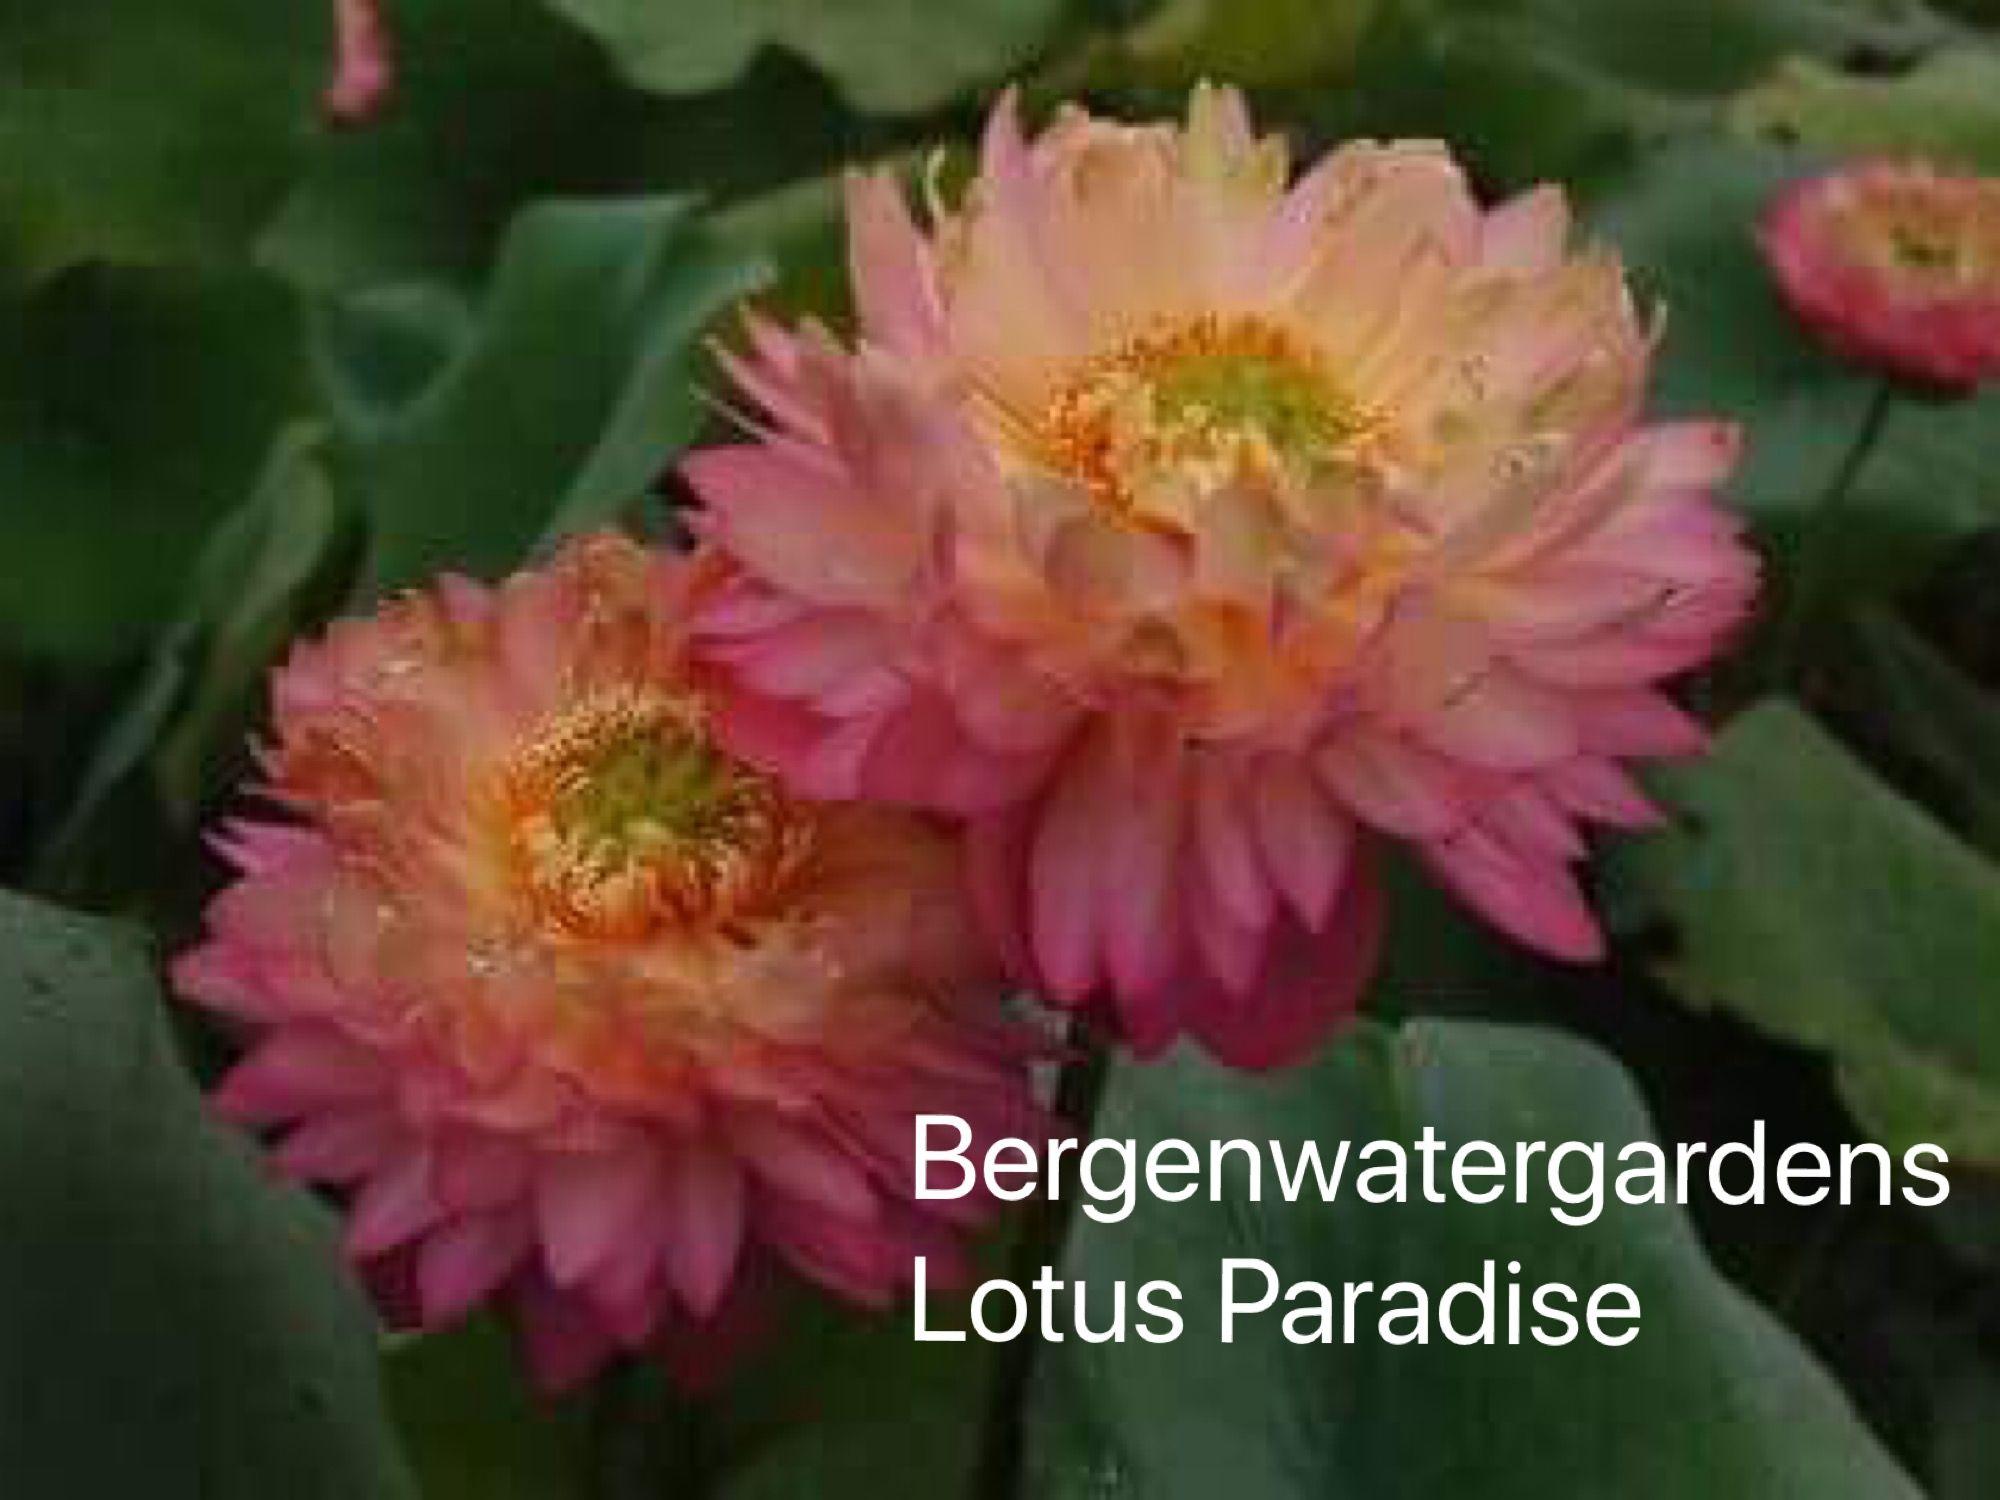 Pin by lotus paradise on lotus paradise pinterest lotus lotus paradise chinese lotus flower tomatoes lotus flowers heaven heavens izmirmasajfo